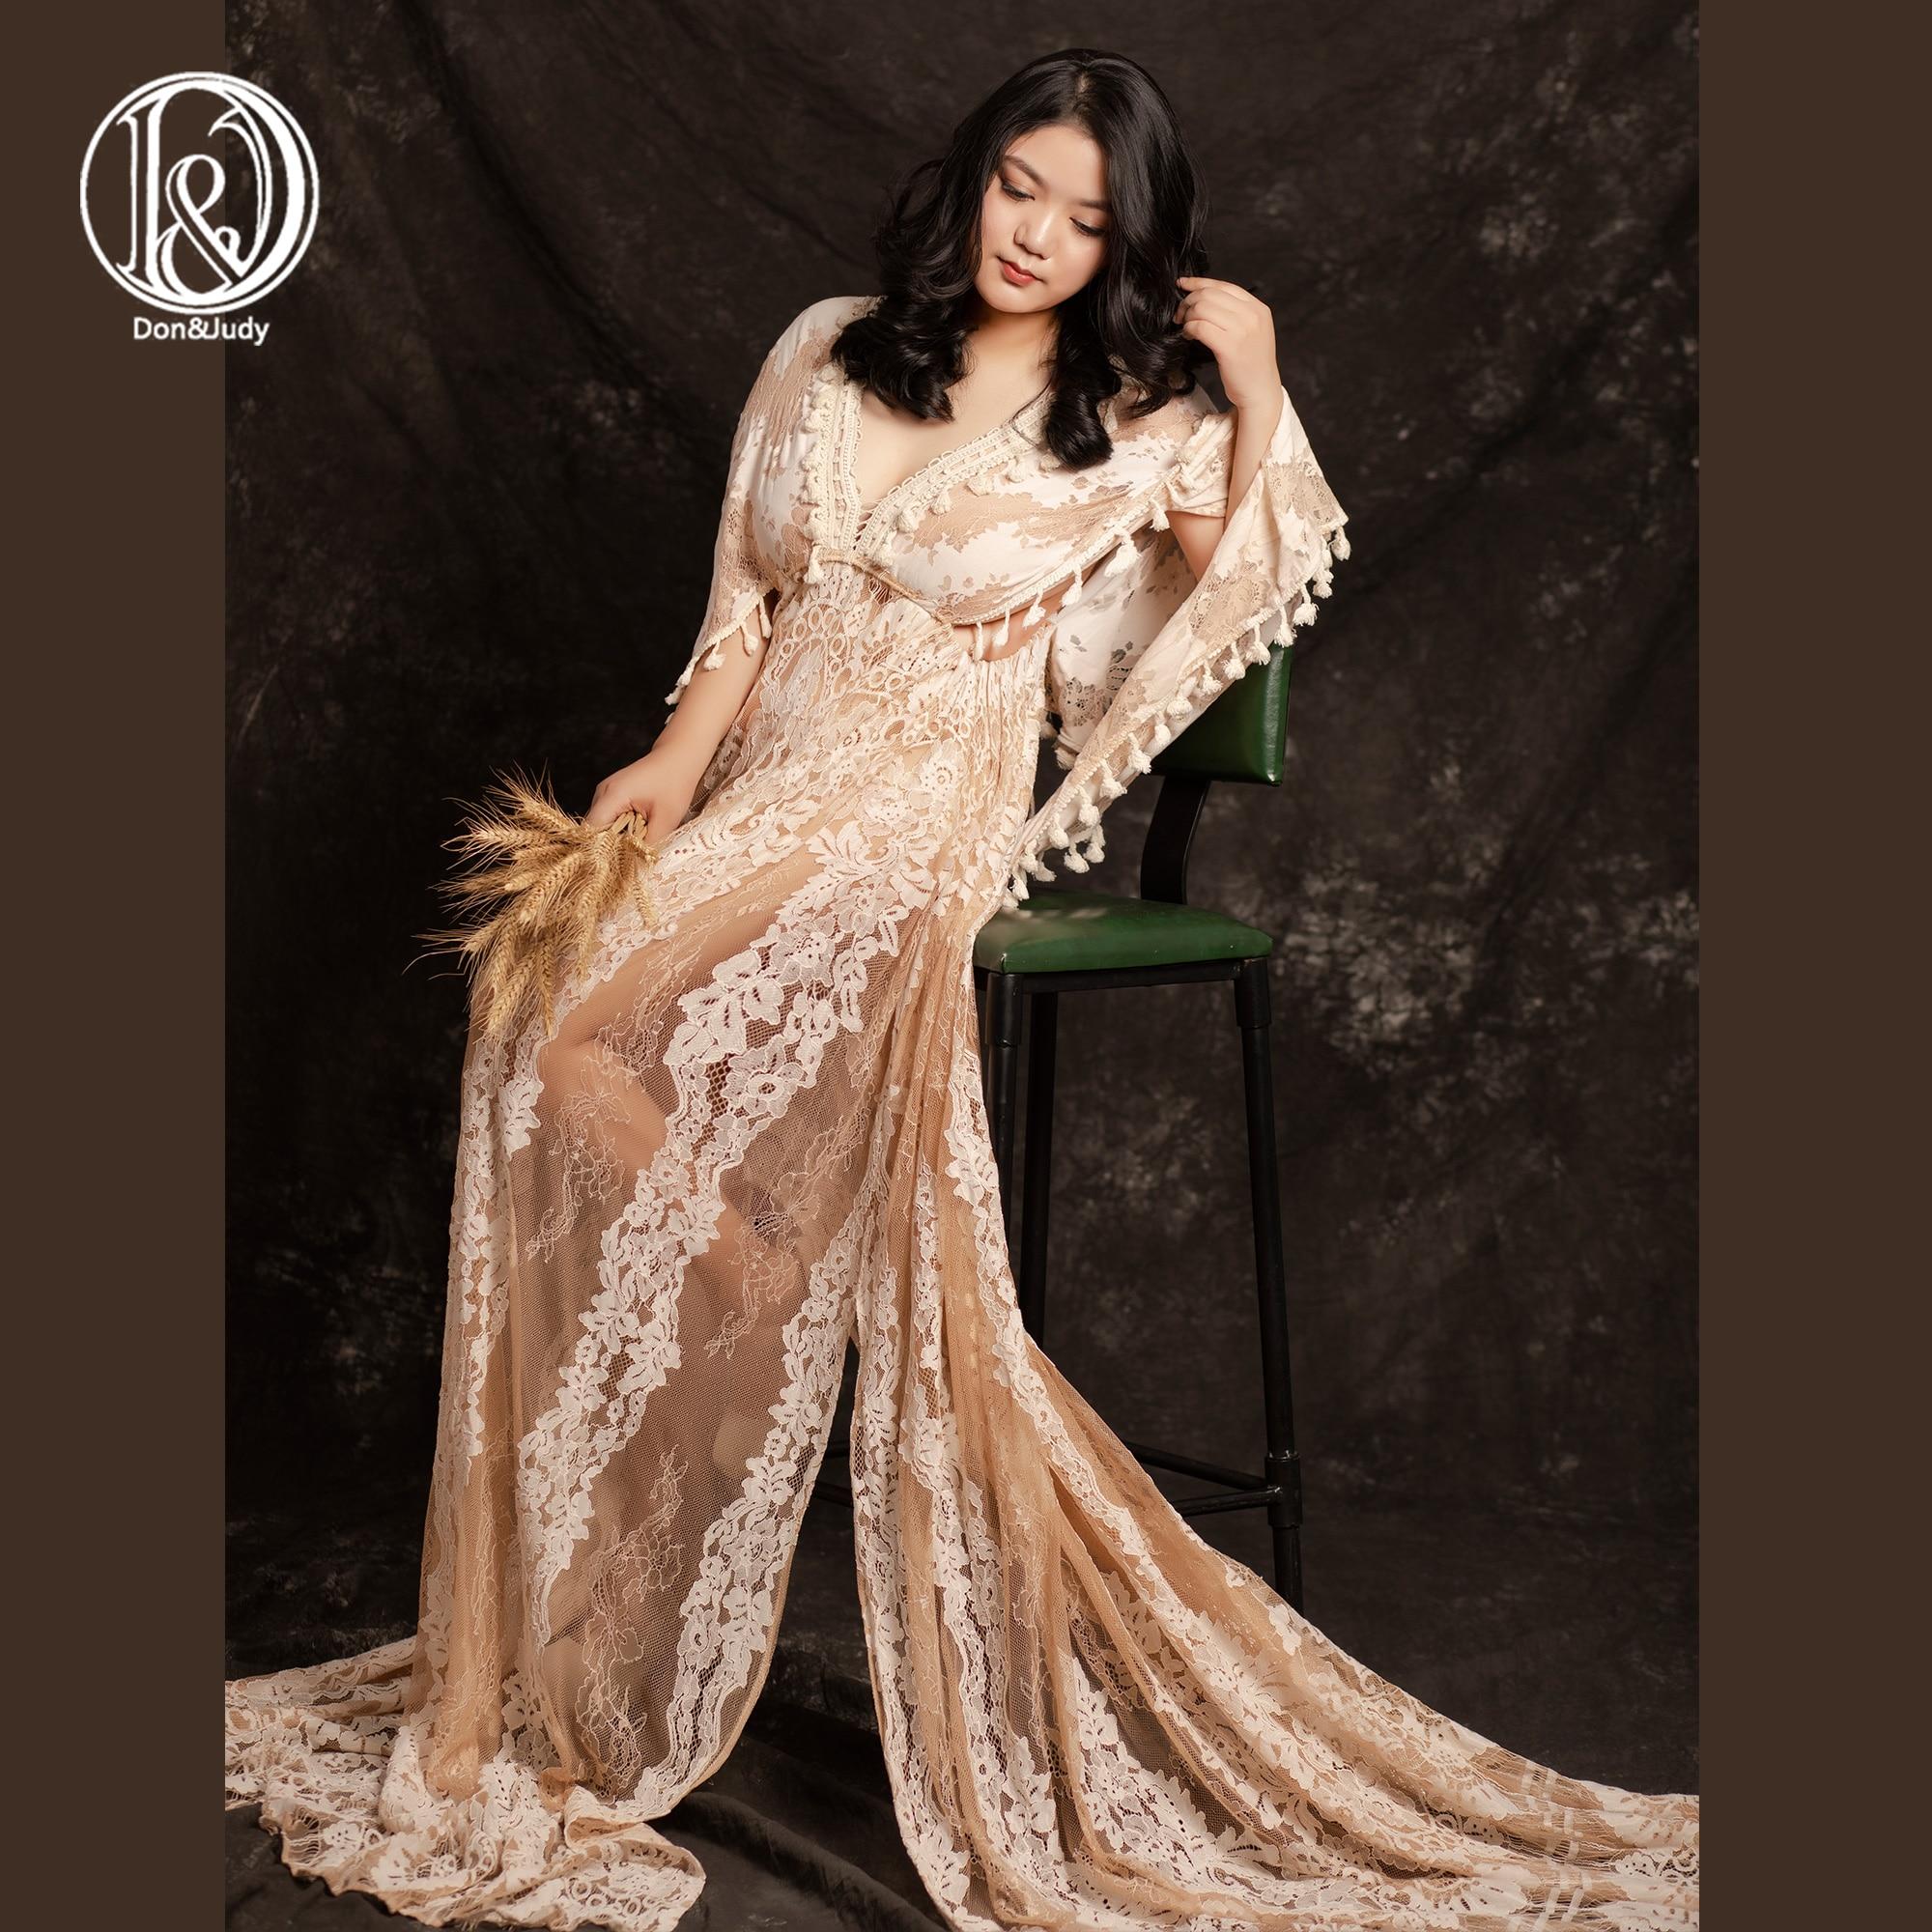 Don&Judy Maternity Photography Props Boho Lace Maxi Khaki Dress Elegant Pregnancy Photo Shoot Women V-neck Maternity Clothes